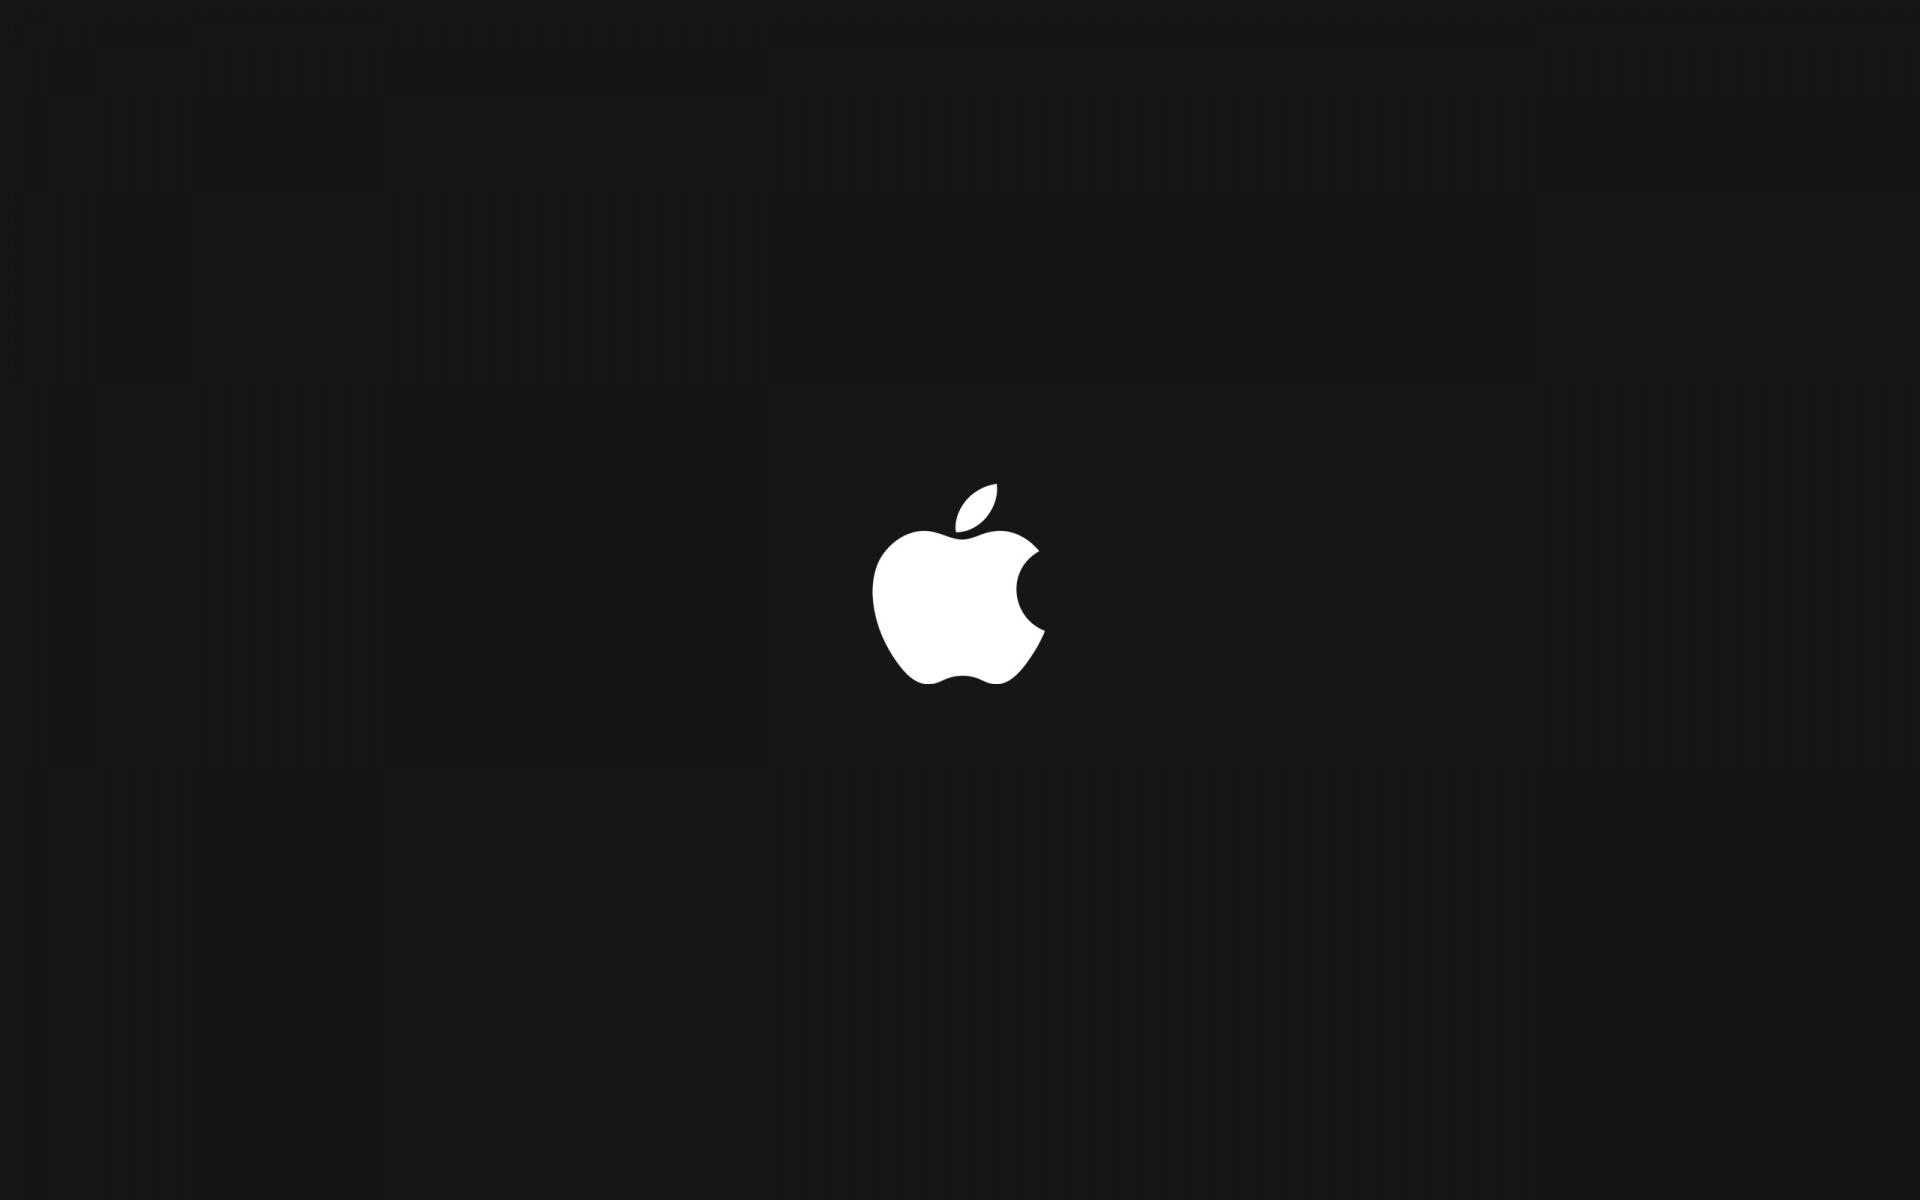 Free Apple Logo Black Desktop PC And Mac